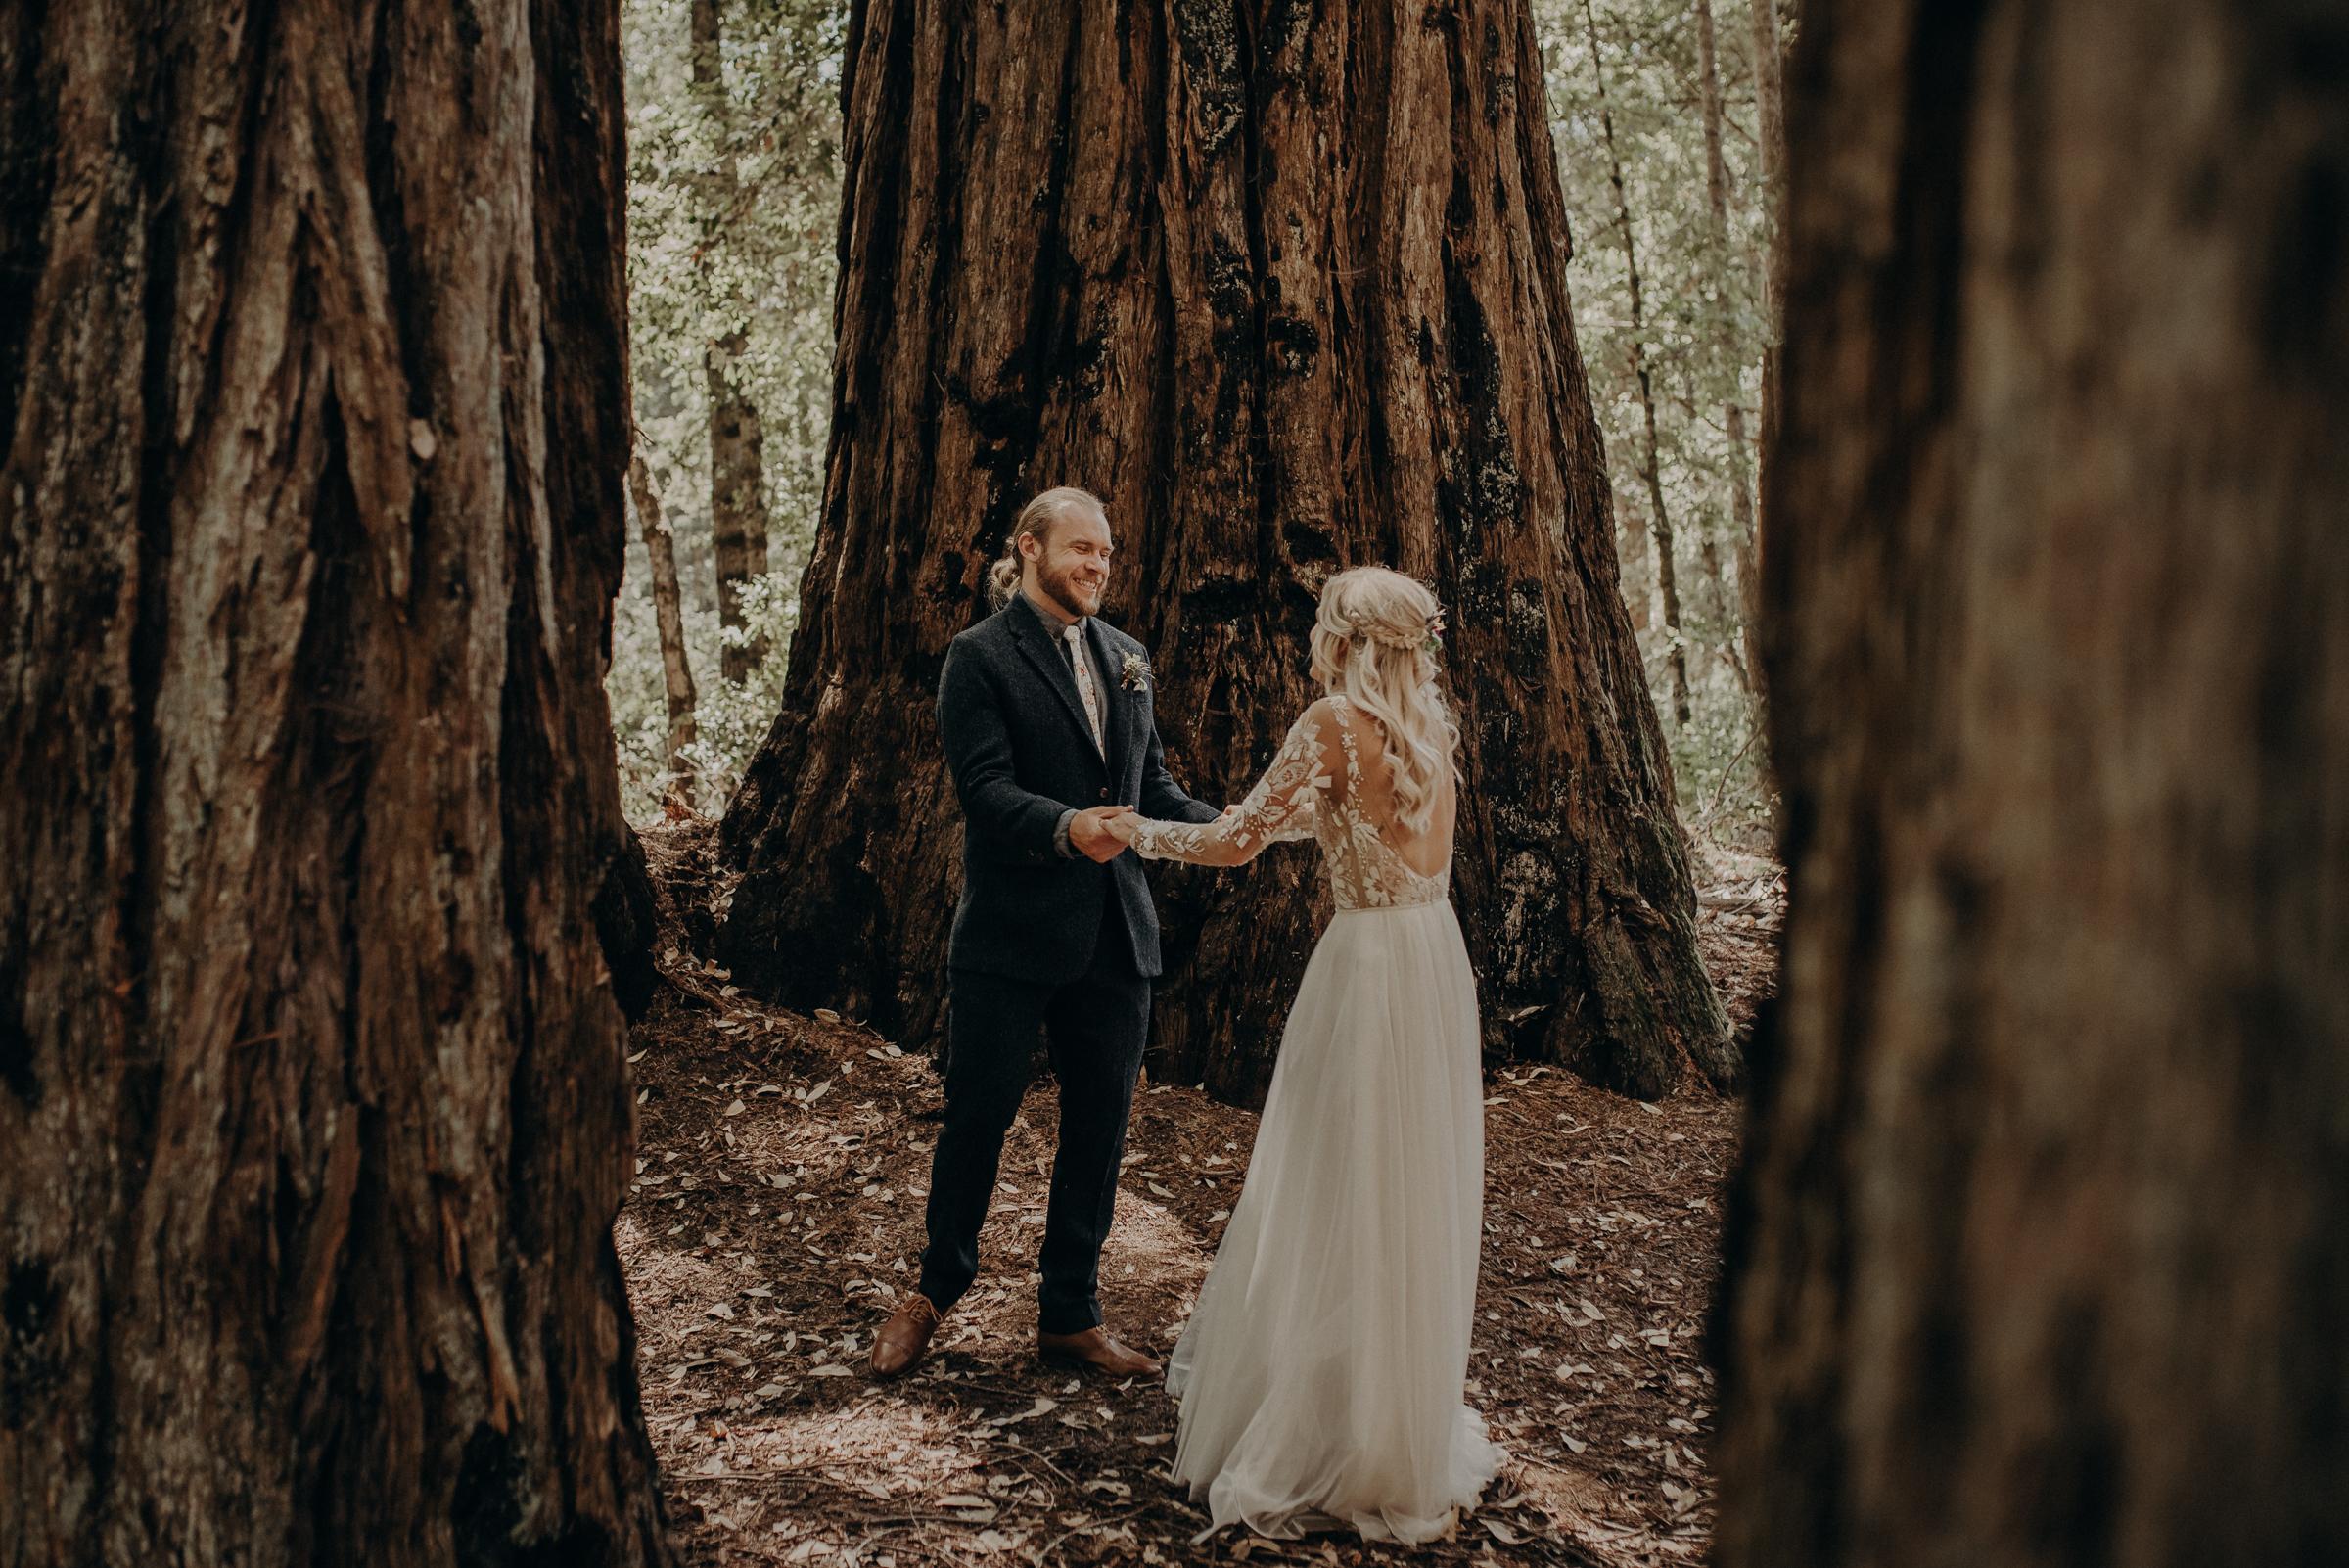 IsaiahAndTaylor.com - California Destination Elopement, Lake Leonard Reserve Wedding, Ukiah-052.jpg